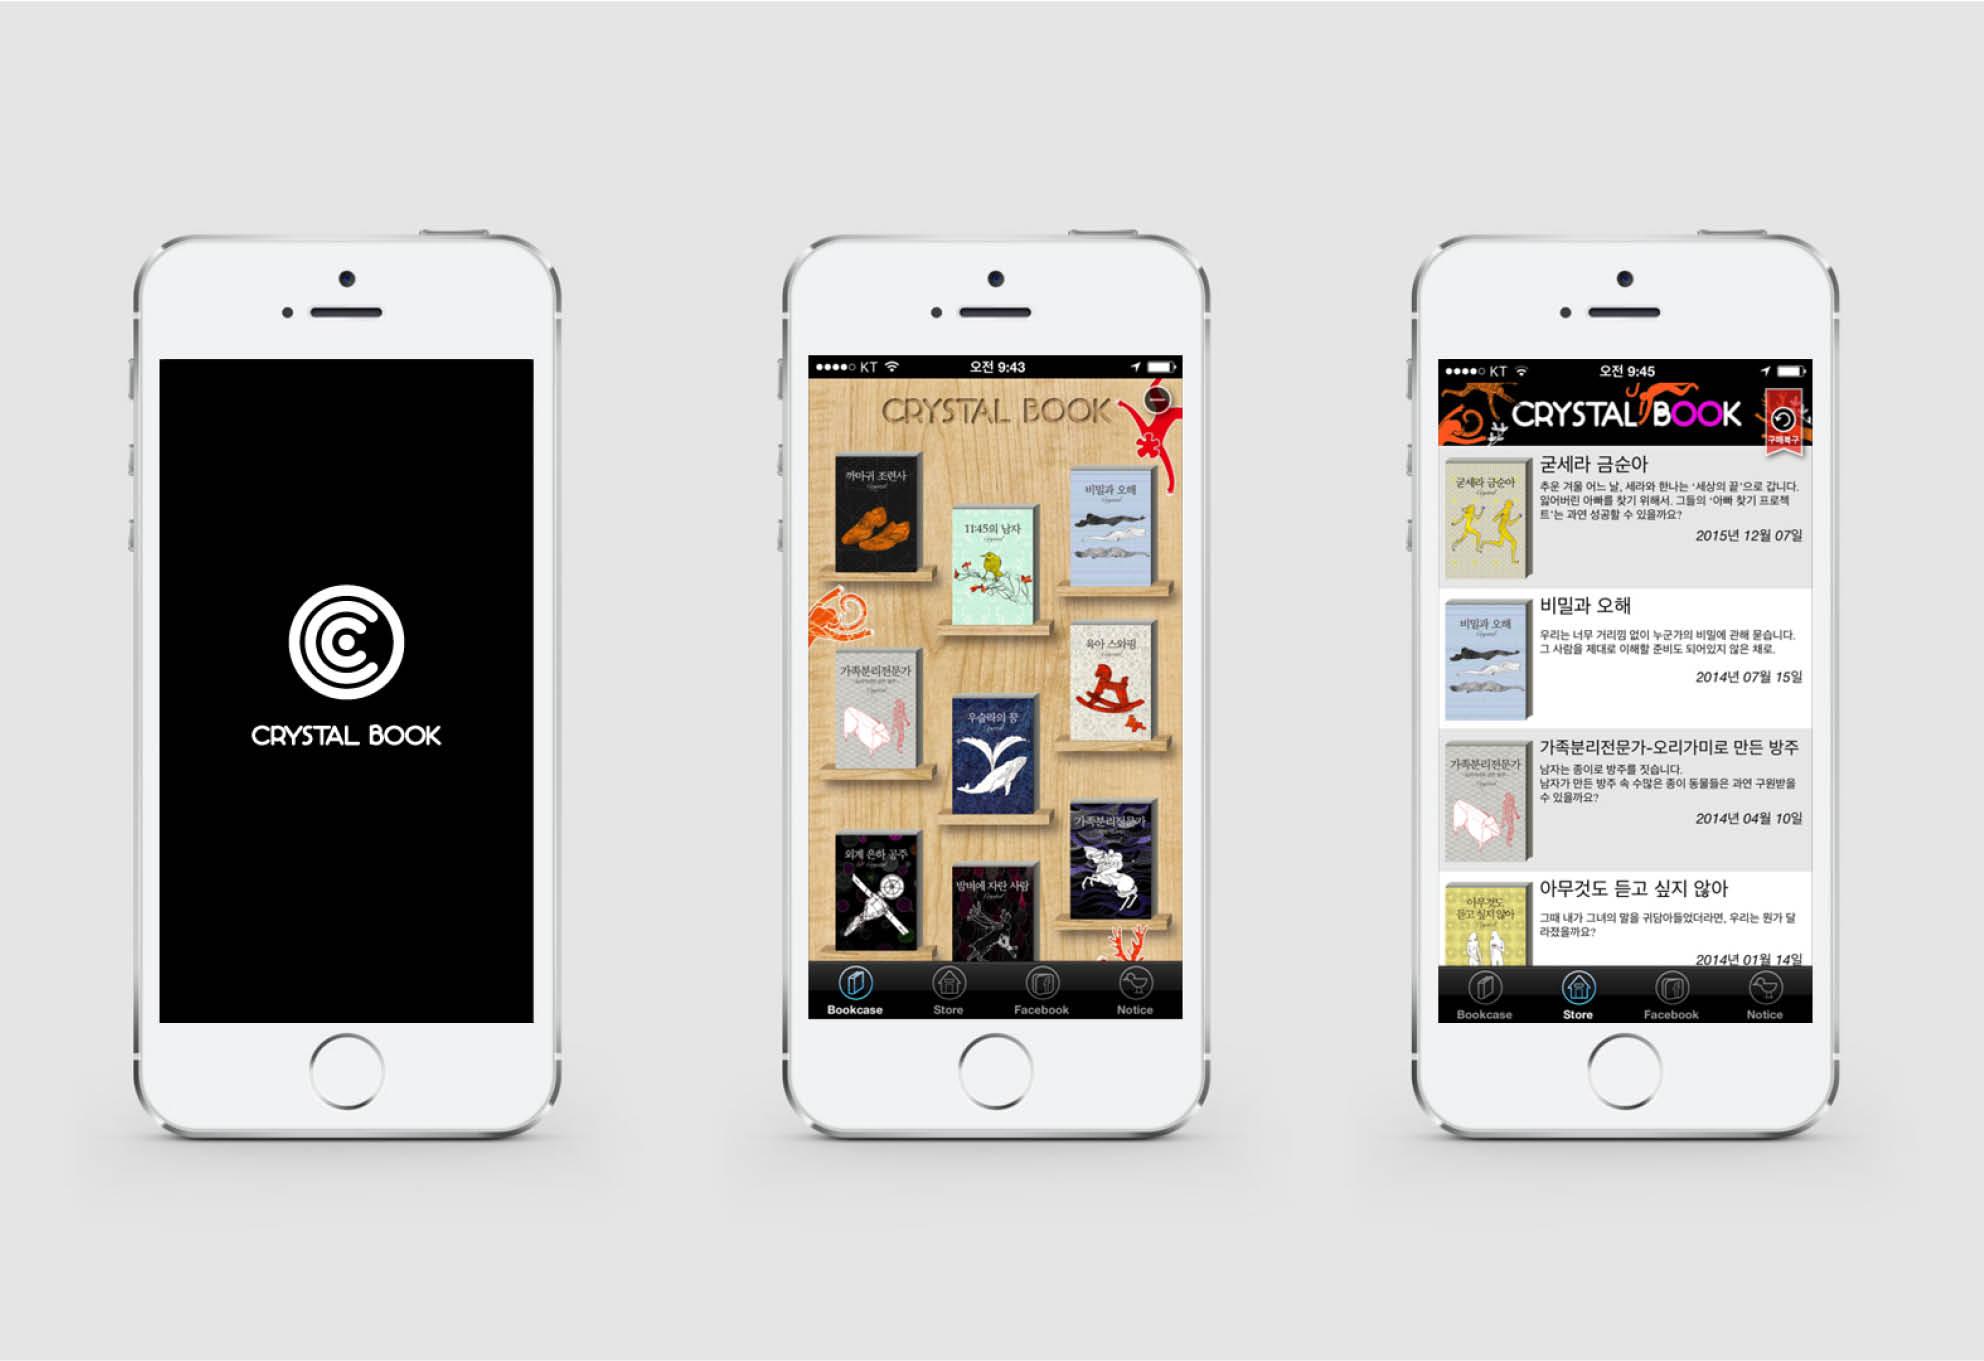 Crystal Book+App Store